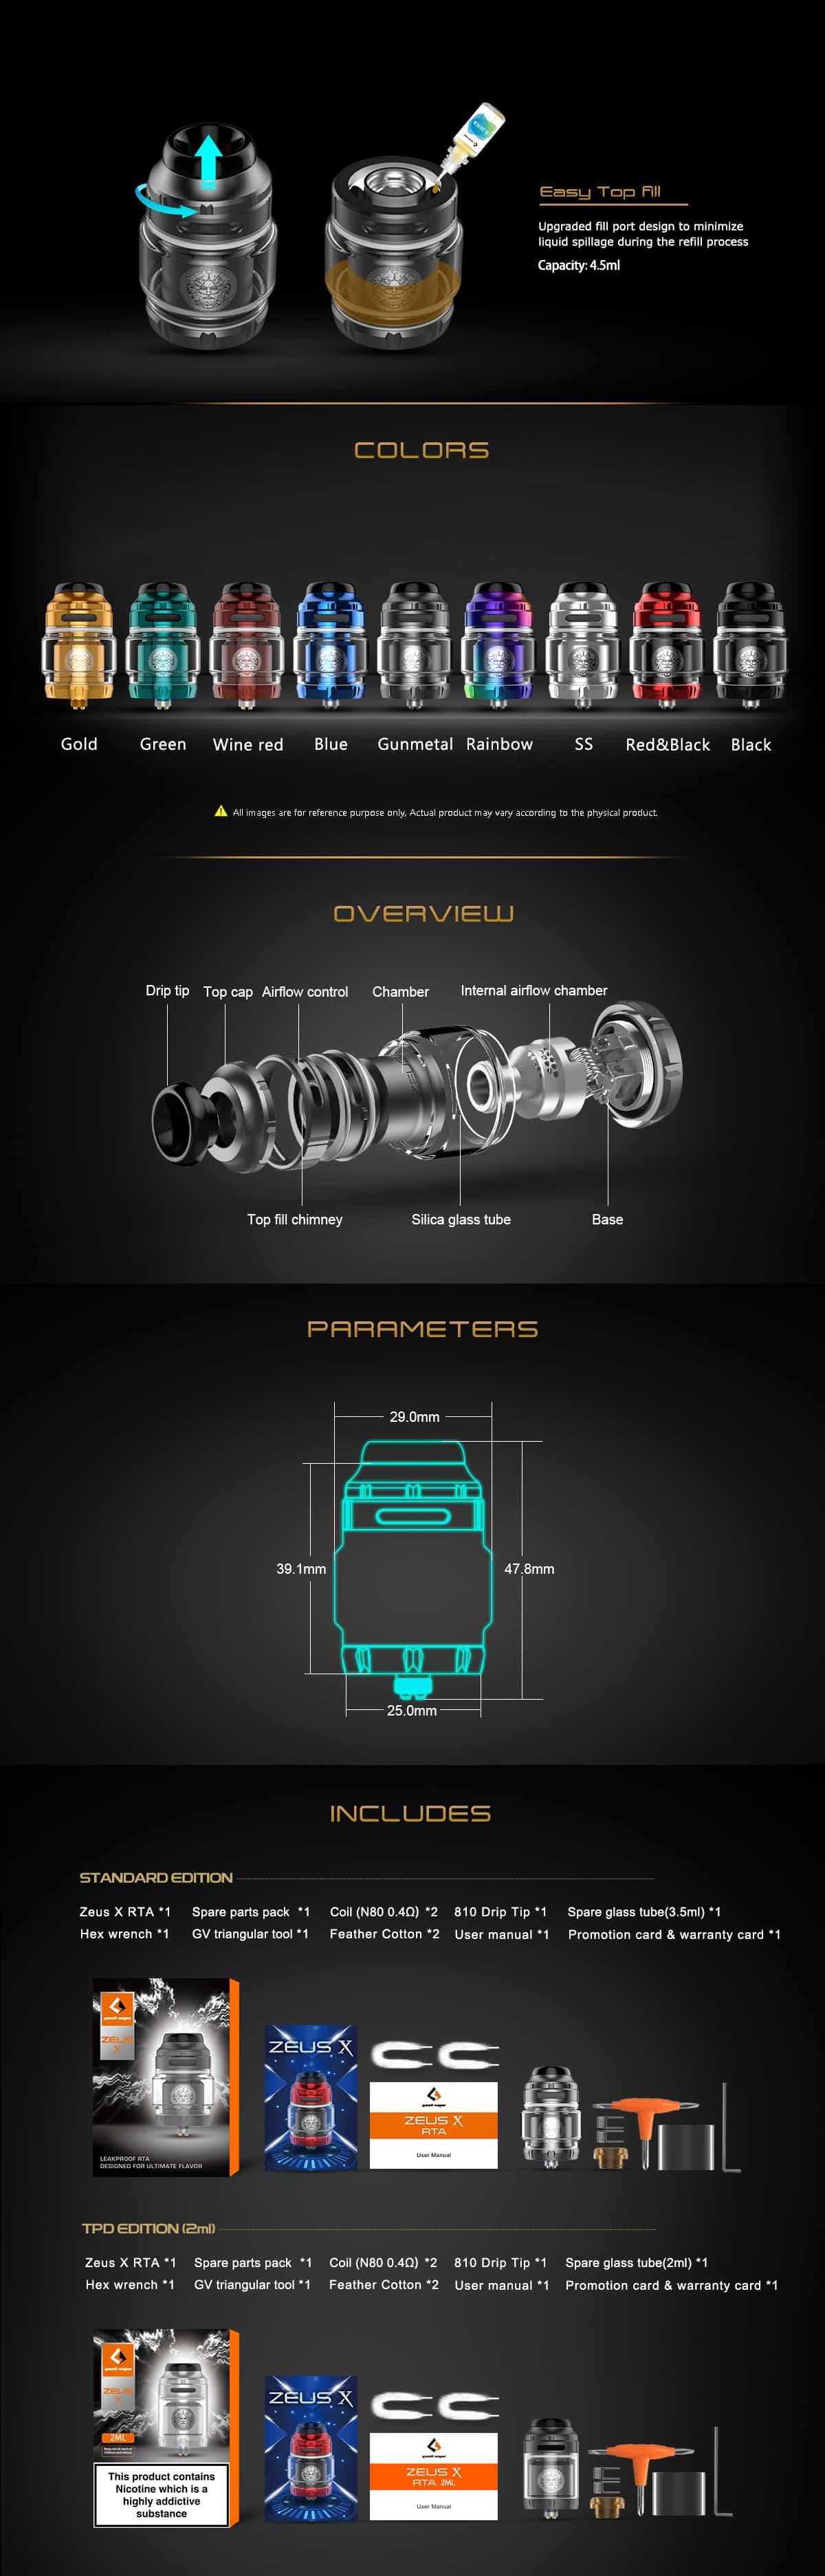 Geekvape Zeus X RTA Atomizer speccs